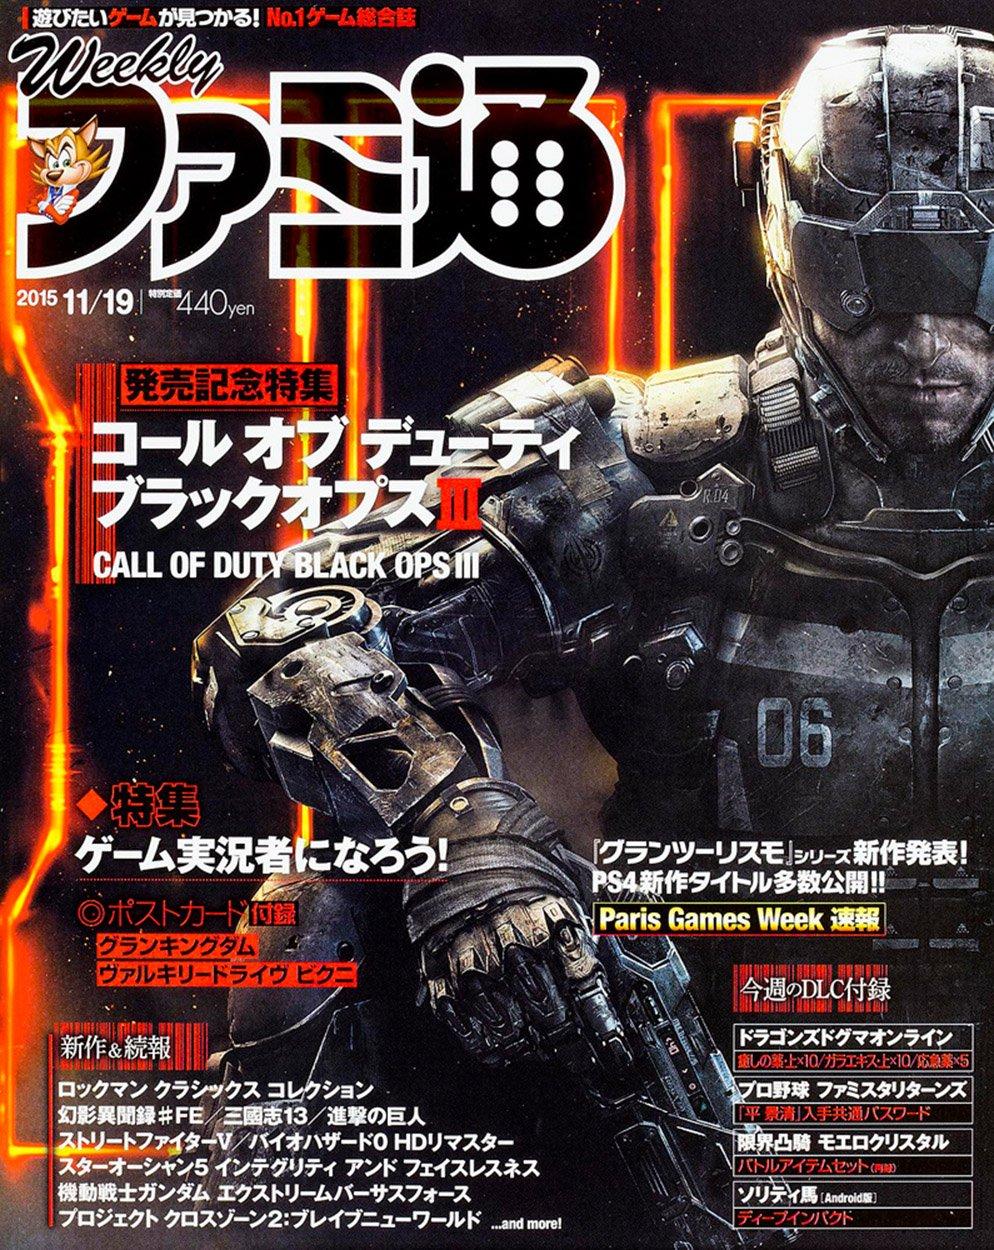 Famitsu 1405 November 19, 2015